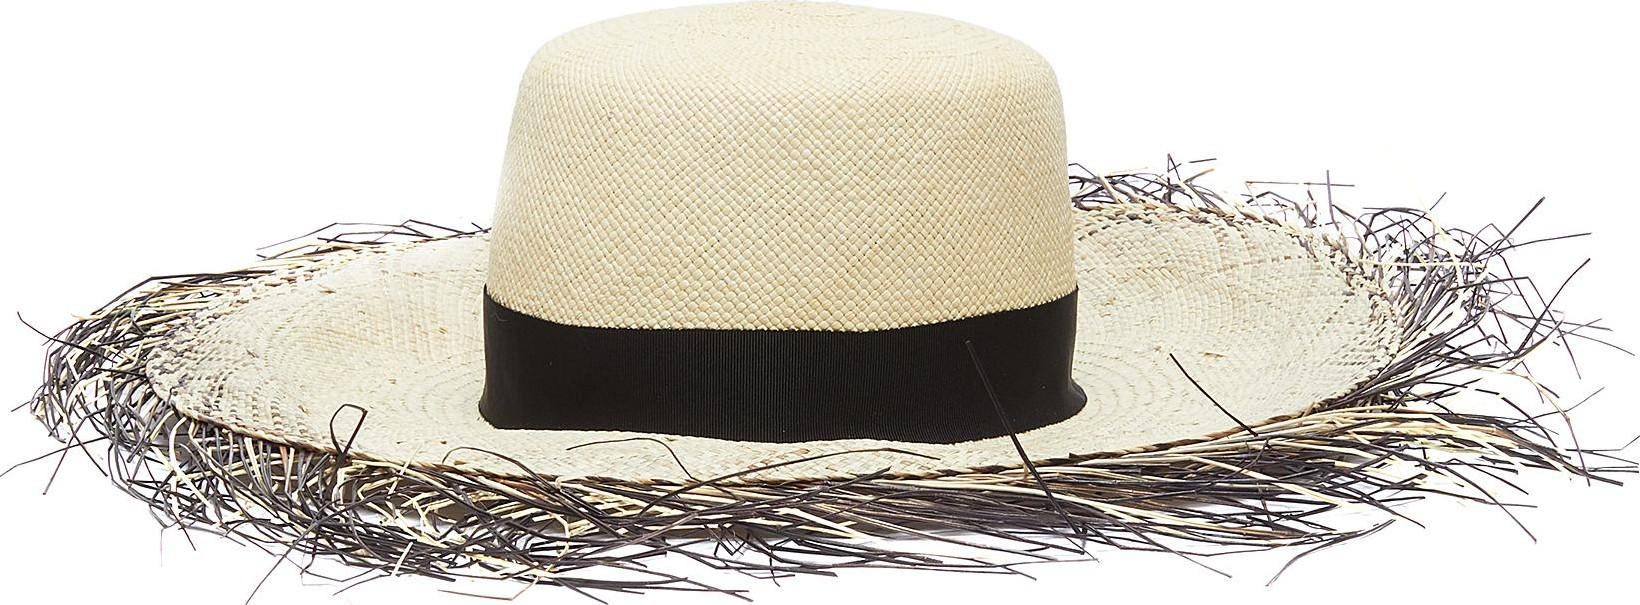 6e3c30a9eff6b Gigi Burris  Beachcomber  dégradé fringe edge Panama straw hat - Mkt